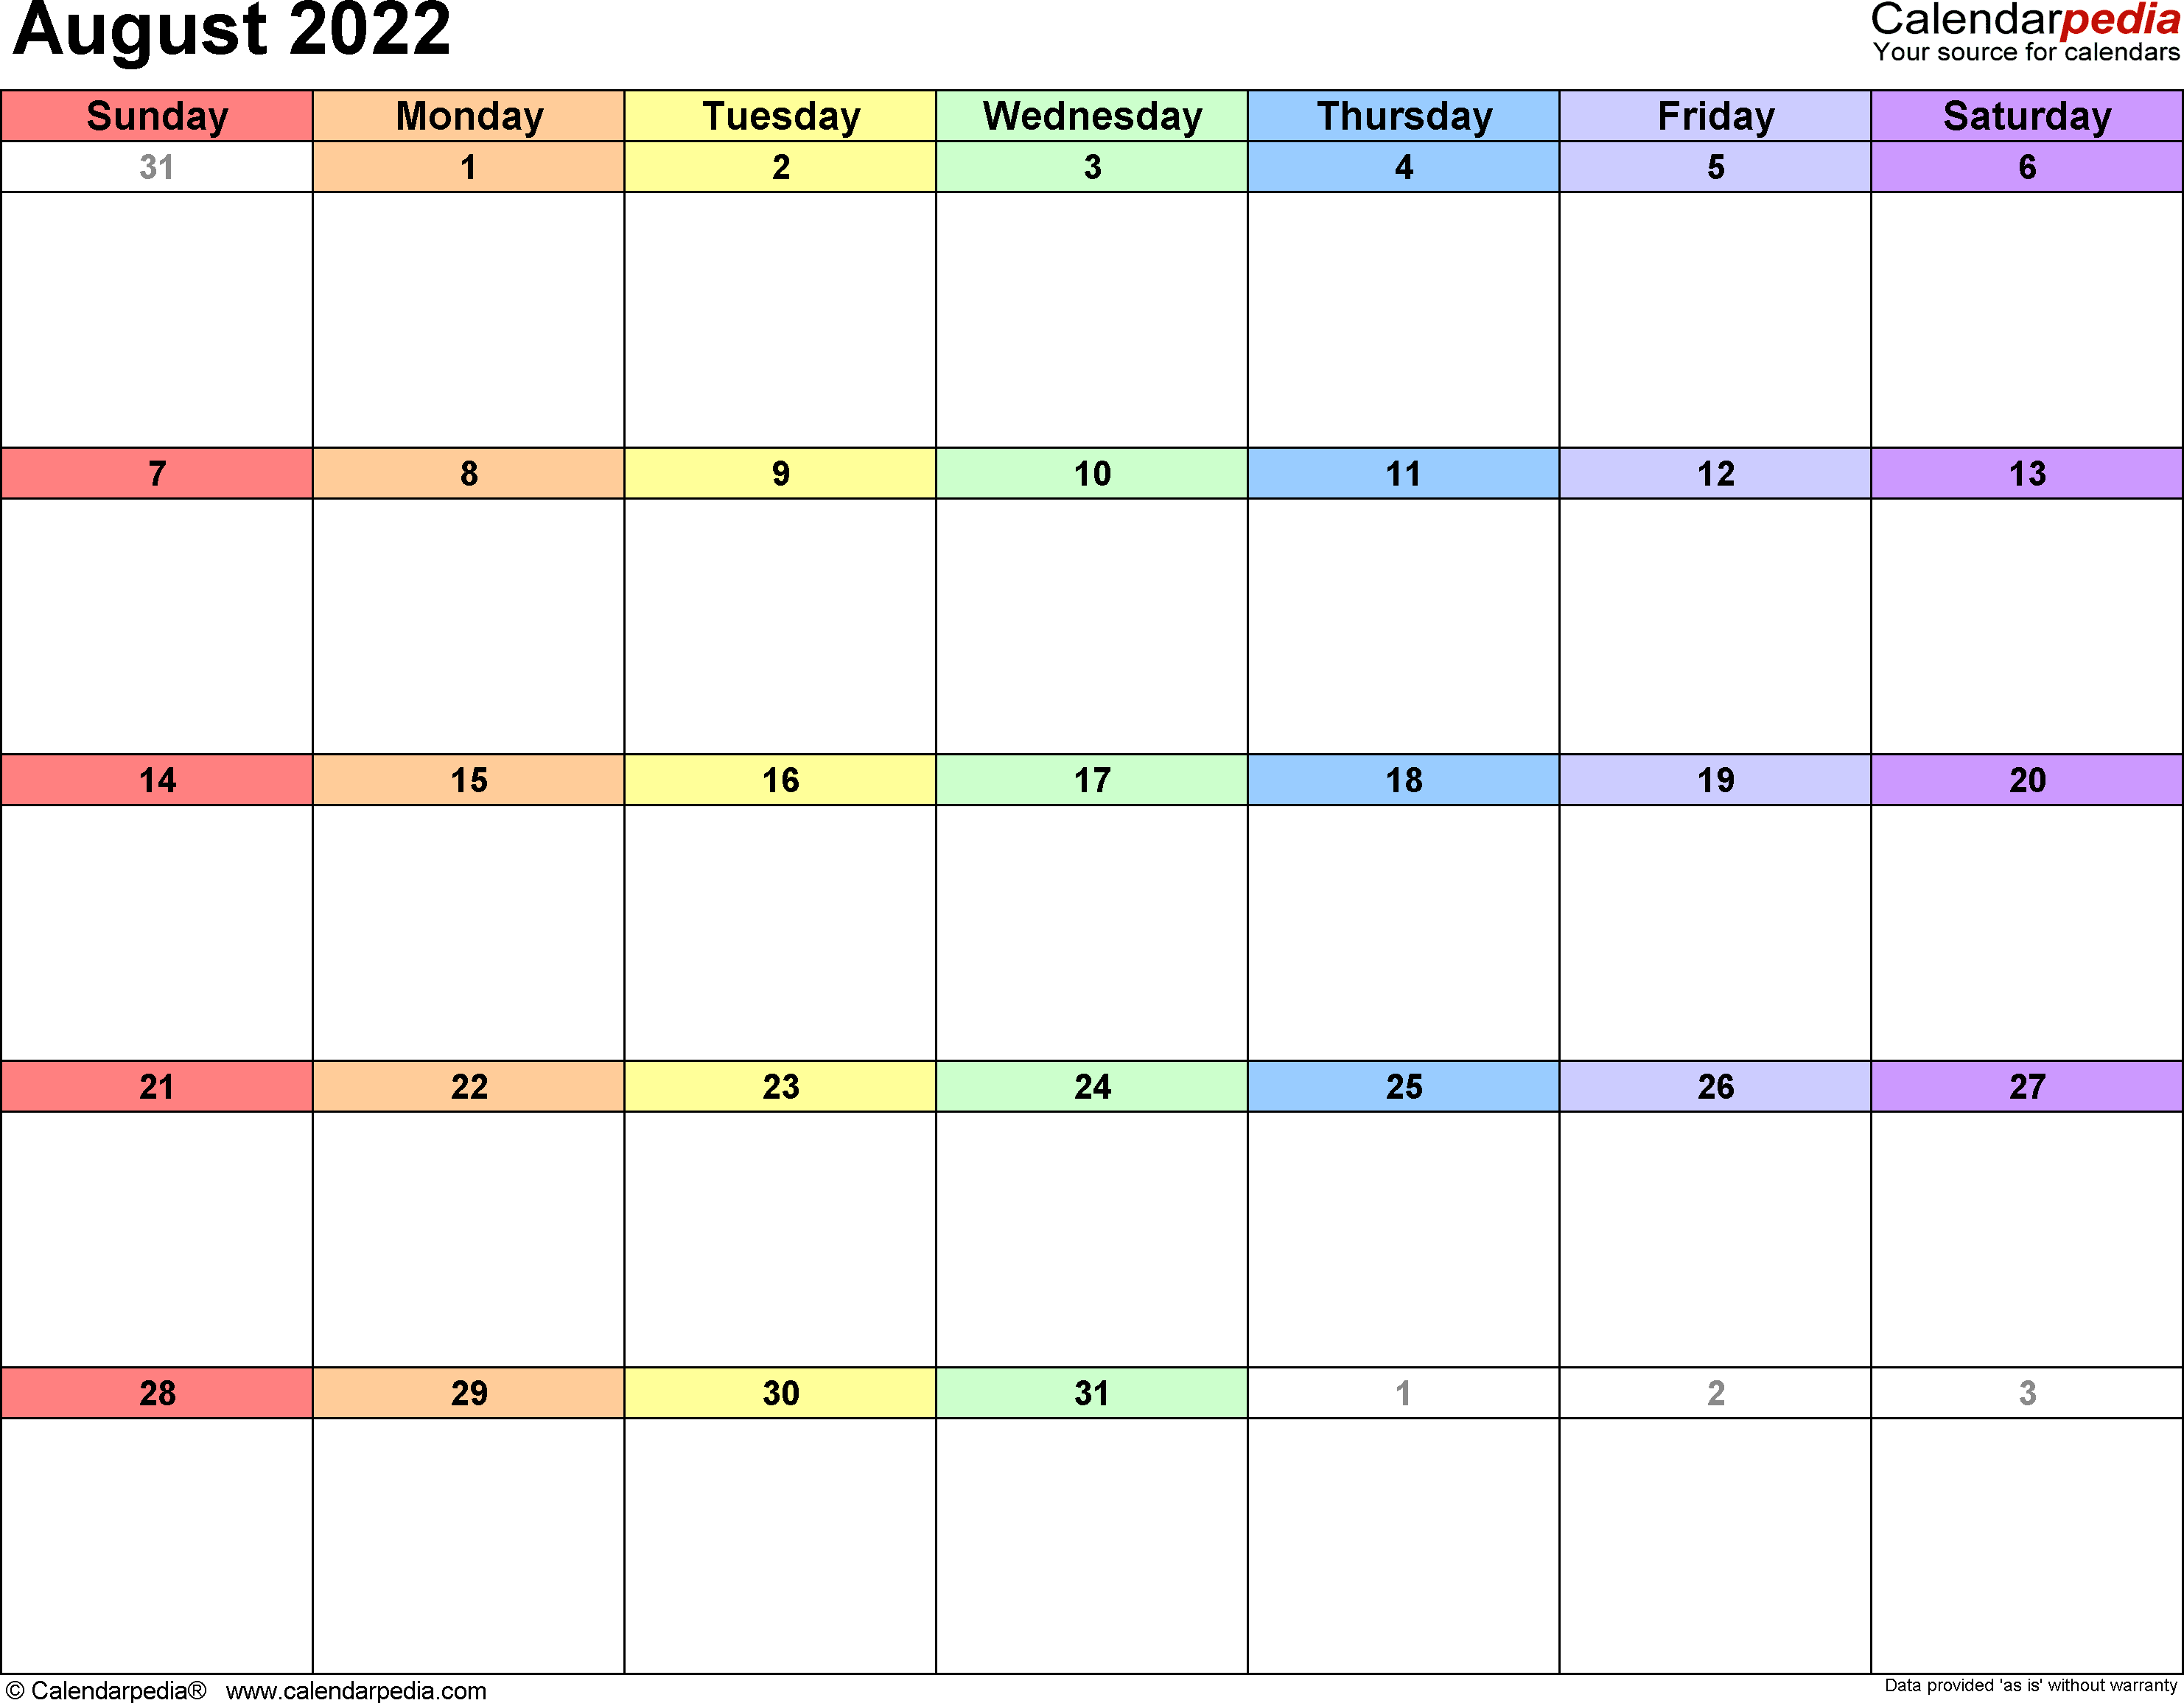 August 2022 calendar printable template